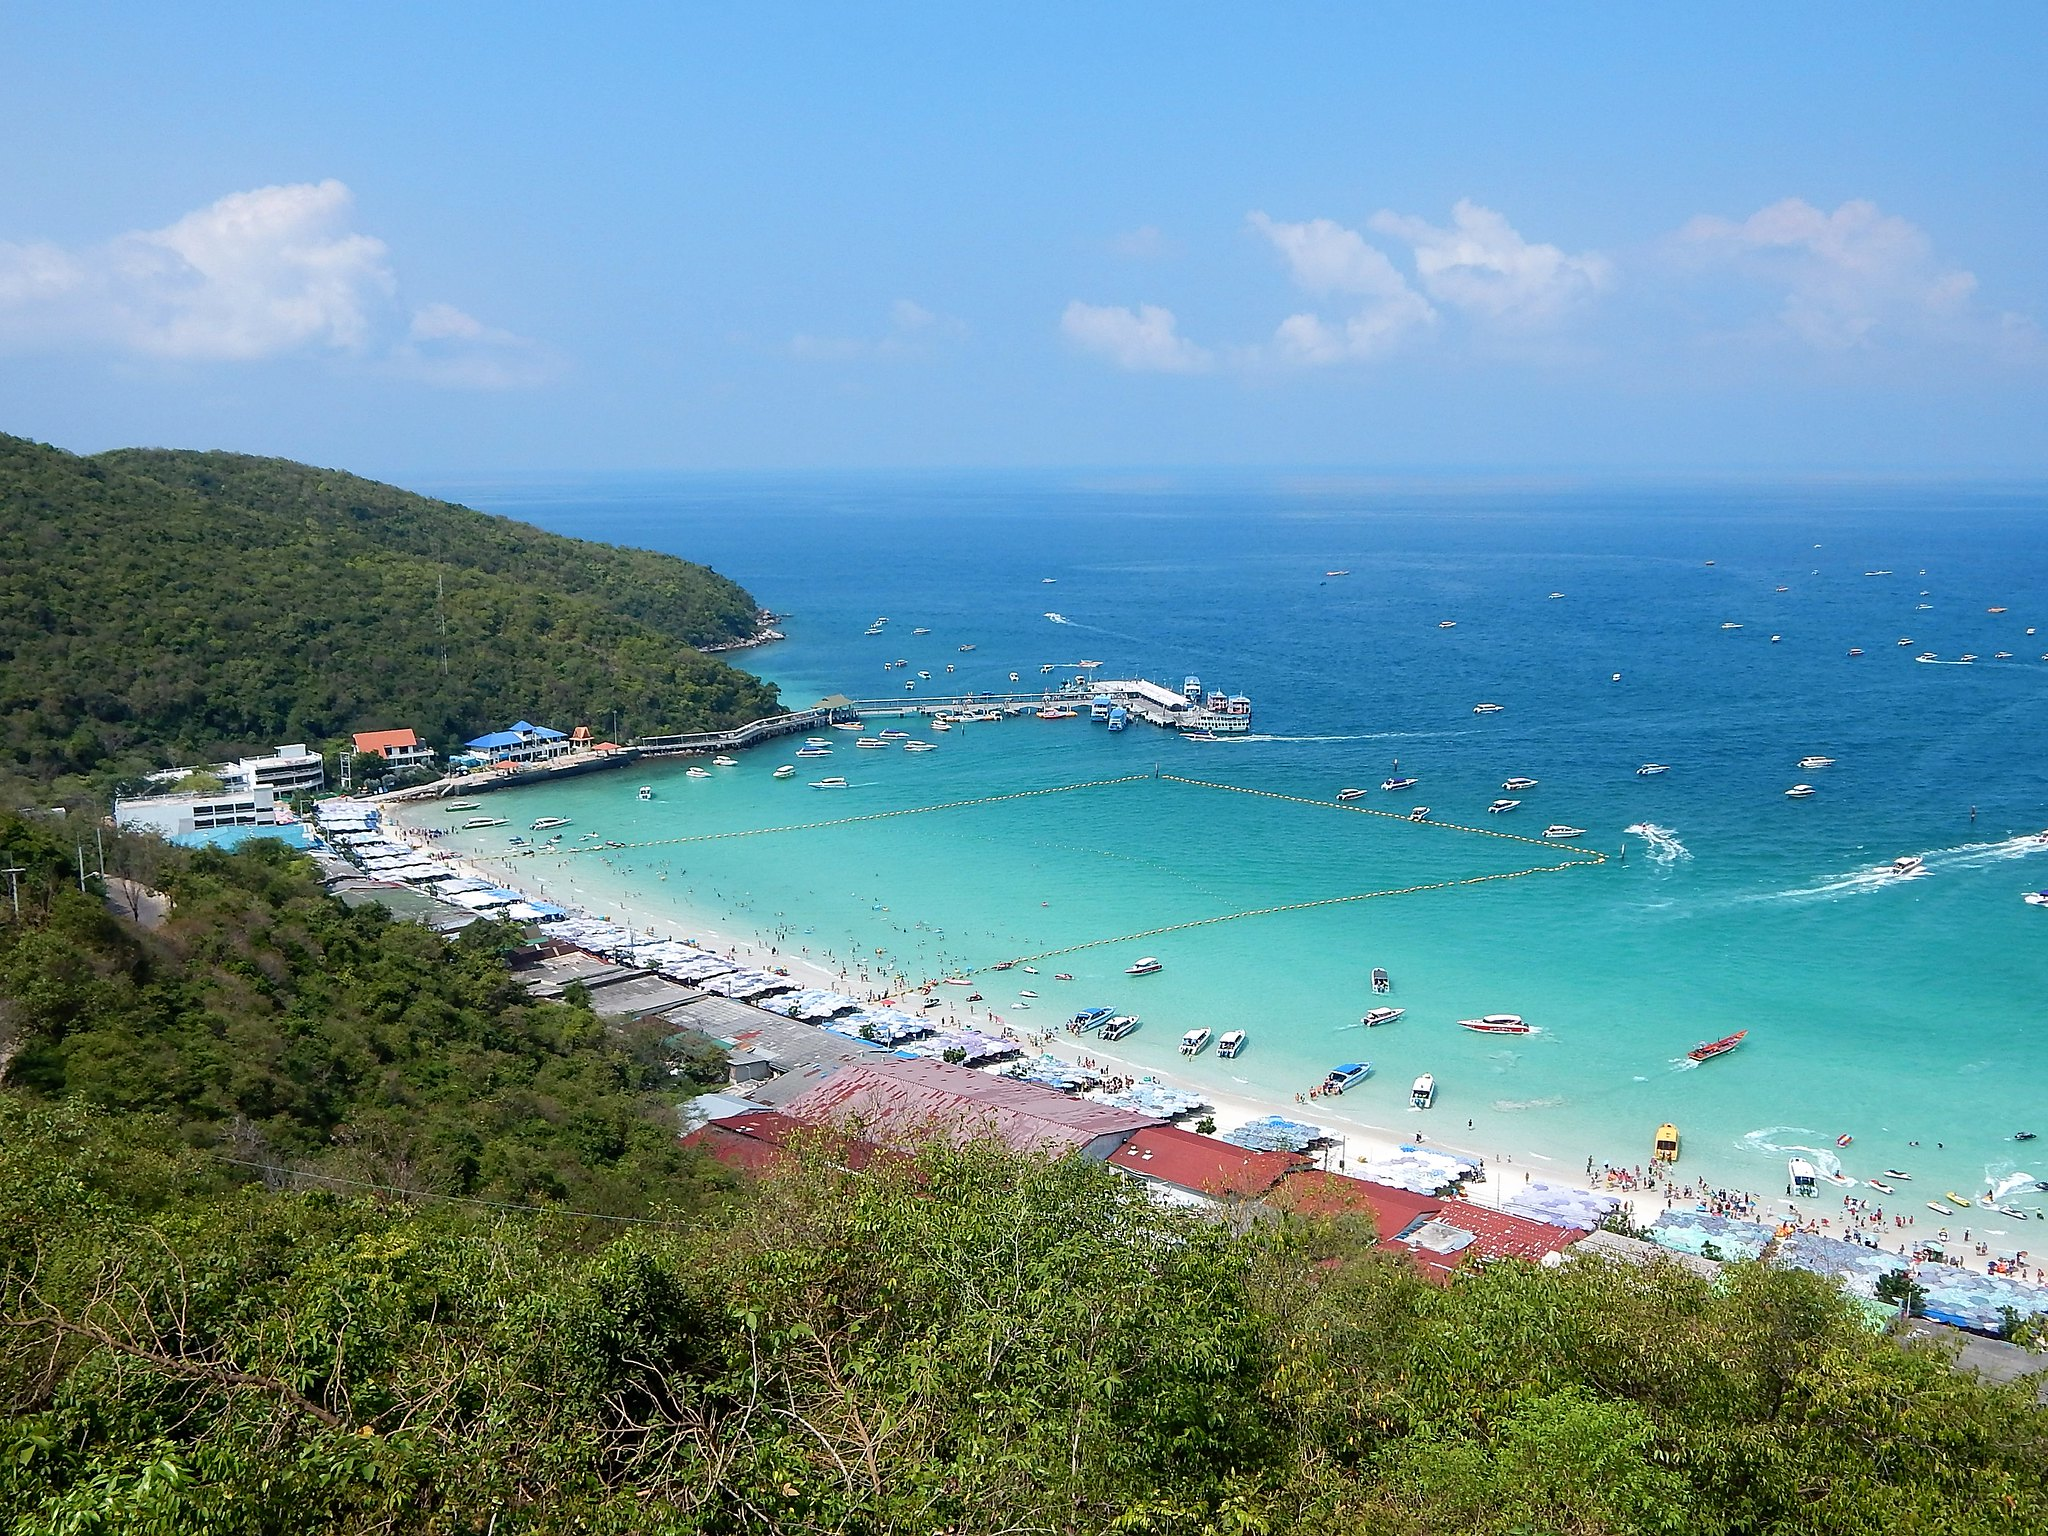 Tawaen Beach op Koh Larn, wit strand en blauw water met boten